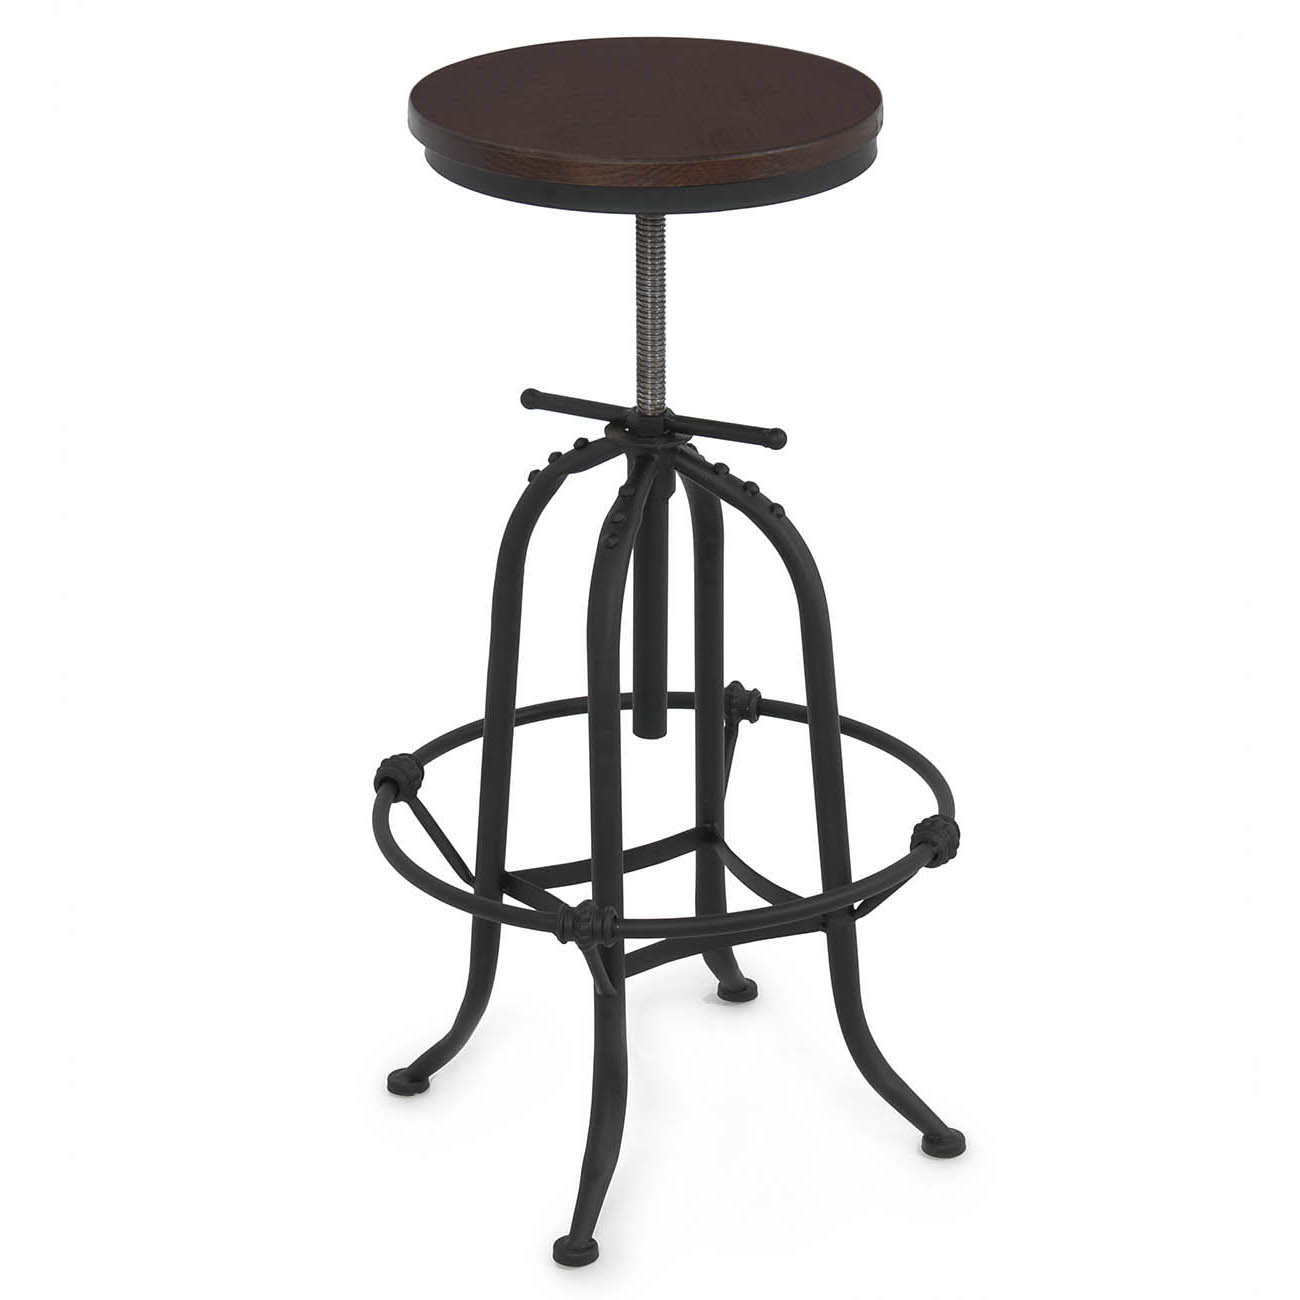 Rustic Bar Stool Home Adjustable Seat Height Countertop